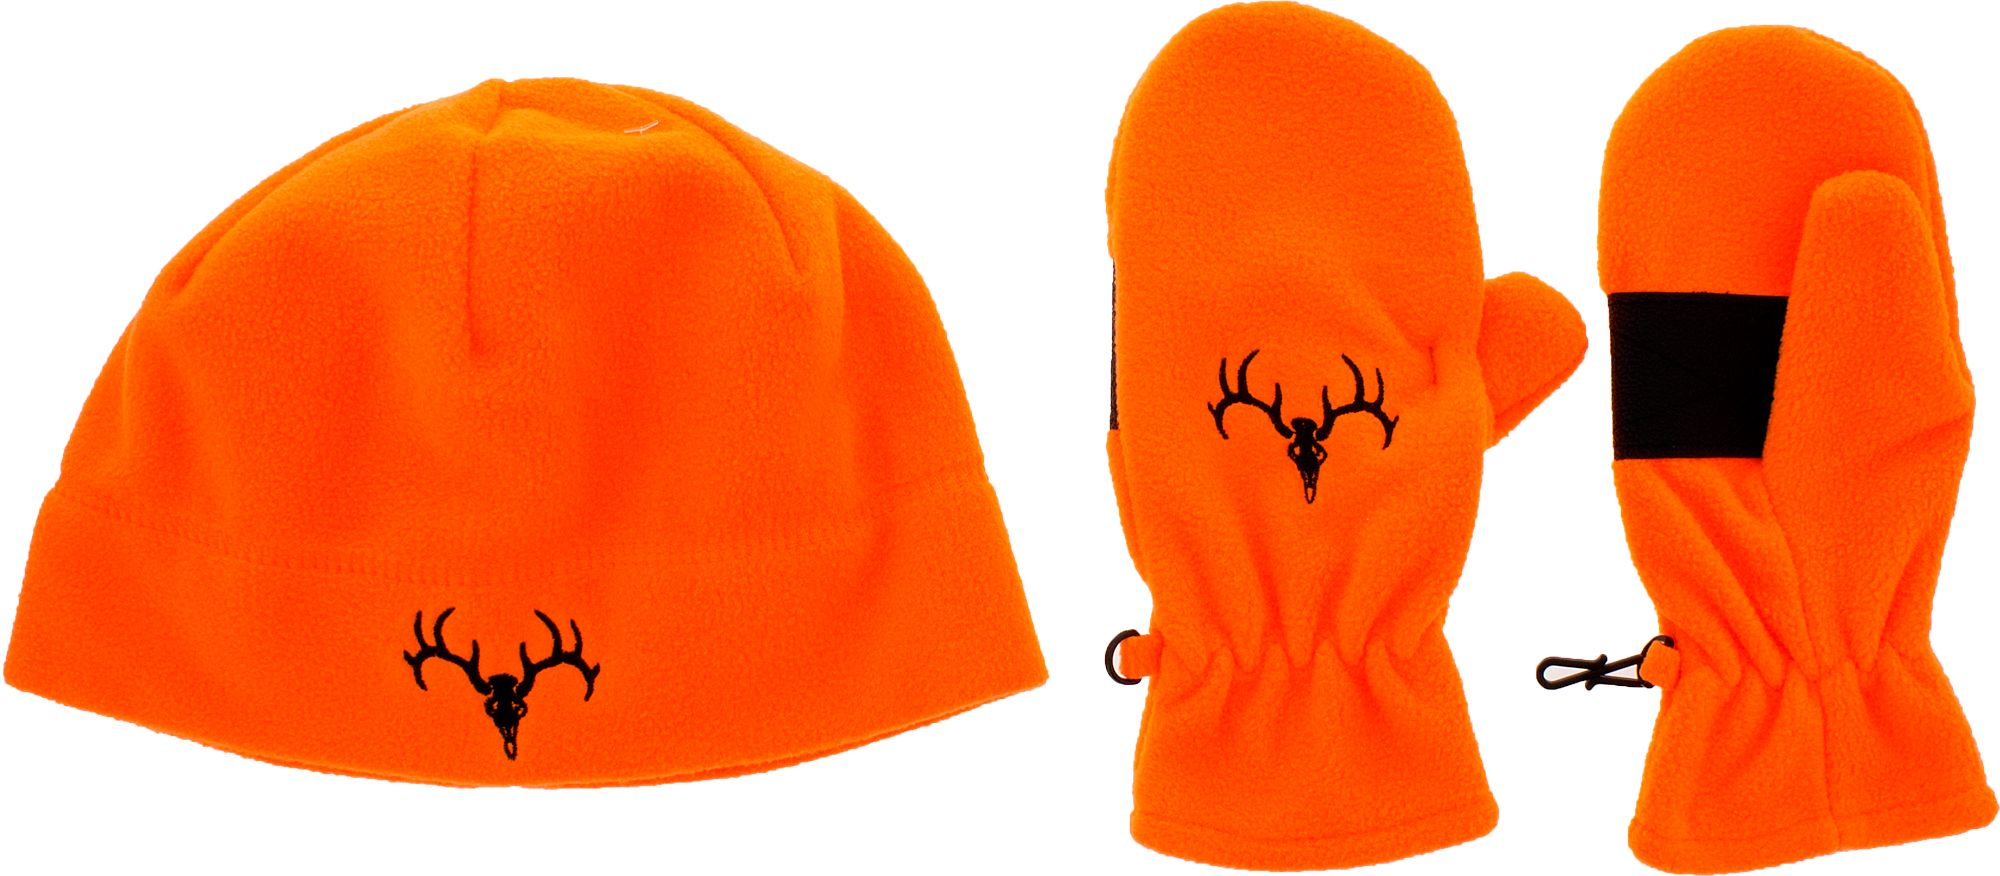 Field & Stream Youth Hunting Skull Beanie and Glove Combo, Kids Unisex, Blaze Orange thumbnail